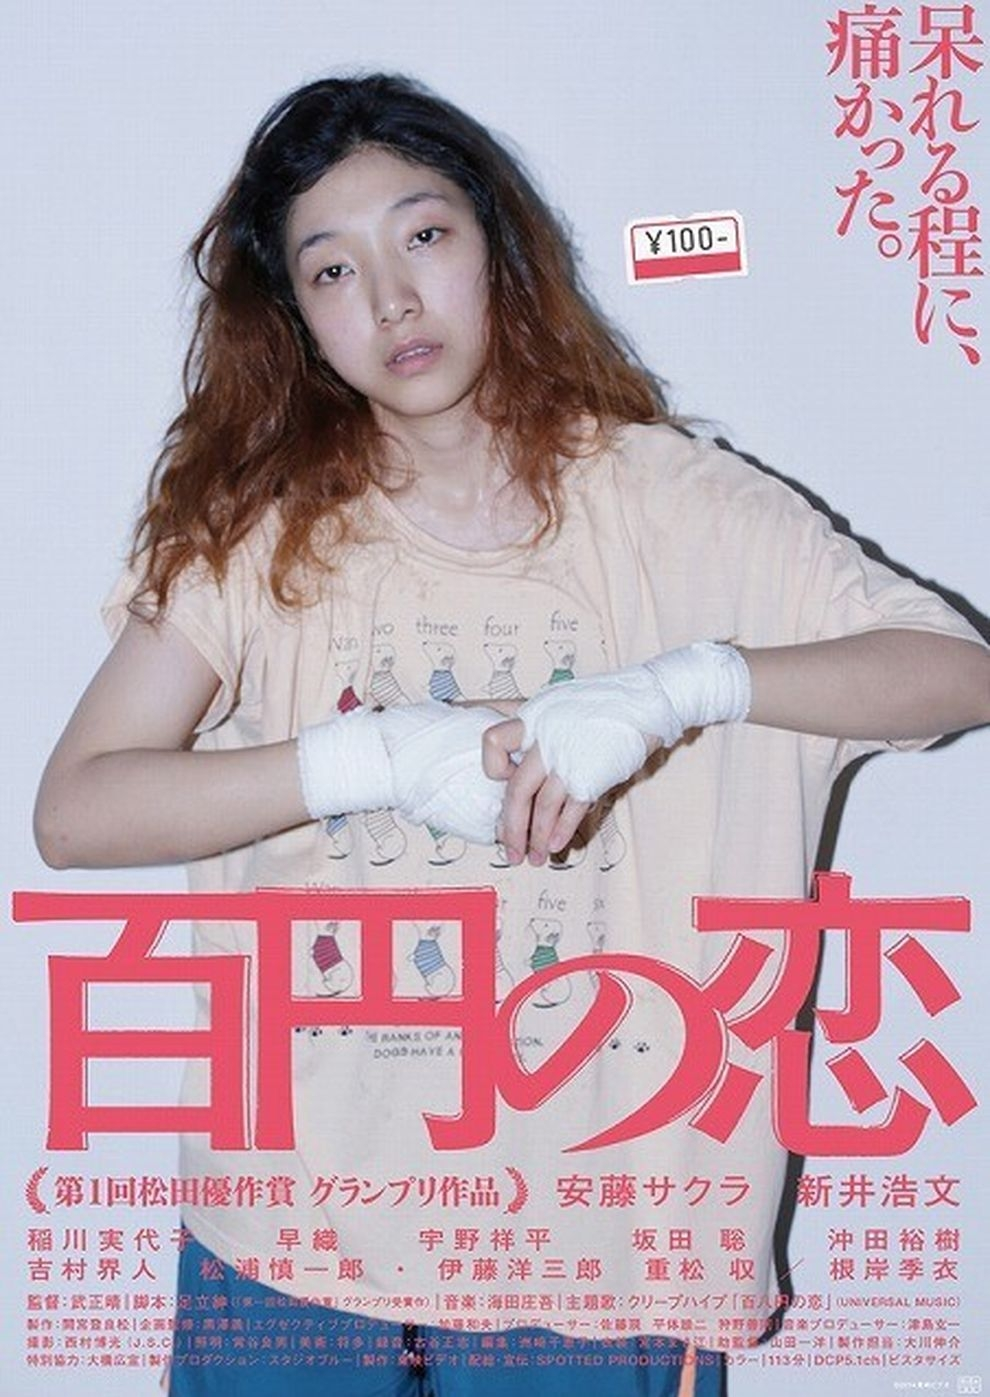 Asia Night 2018: 100 Yen Love (Poster)